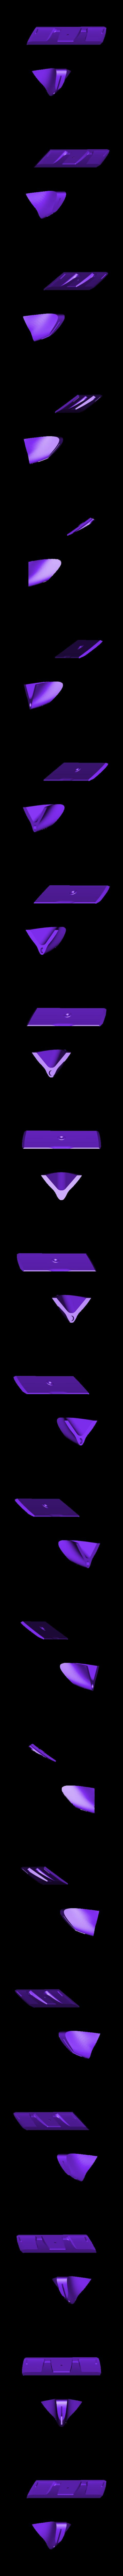 OpenRC_2017_MCL_Lid_Color1.stl Download free STL file OpenRC F1 Dual Color McLaren Edition • 3D printer model, DanielNoree